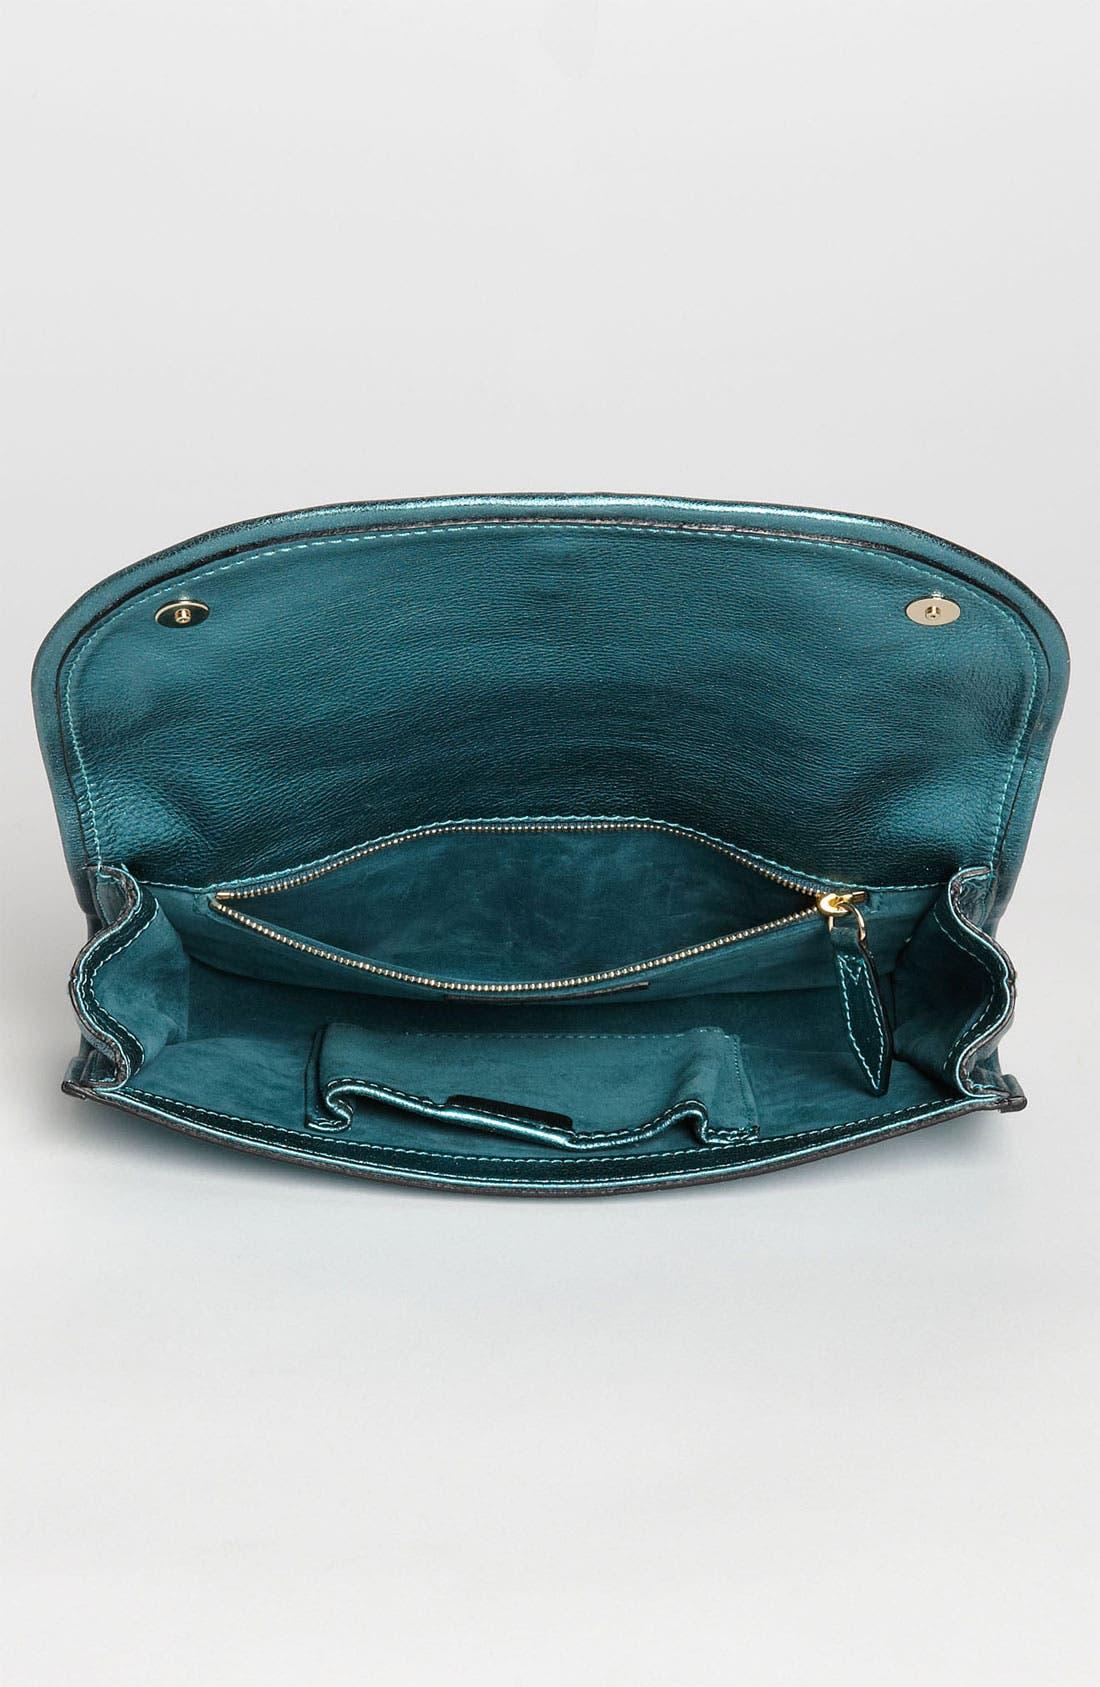 Alternate Image 3  - Burberry 'Soft Grainy Metallic' Leather Clutch